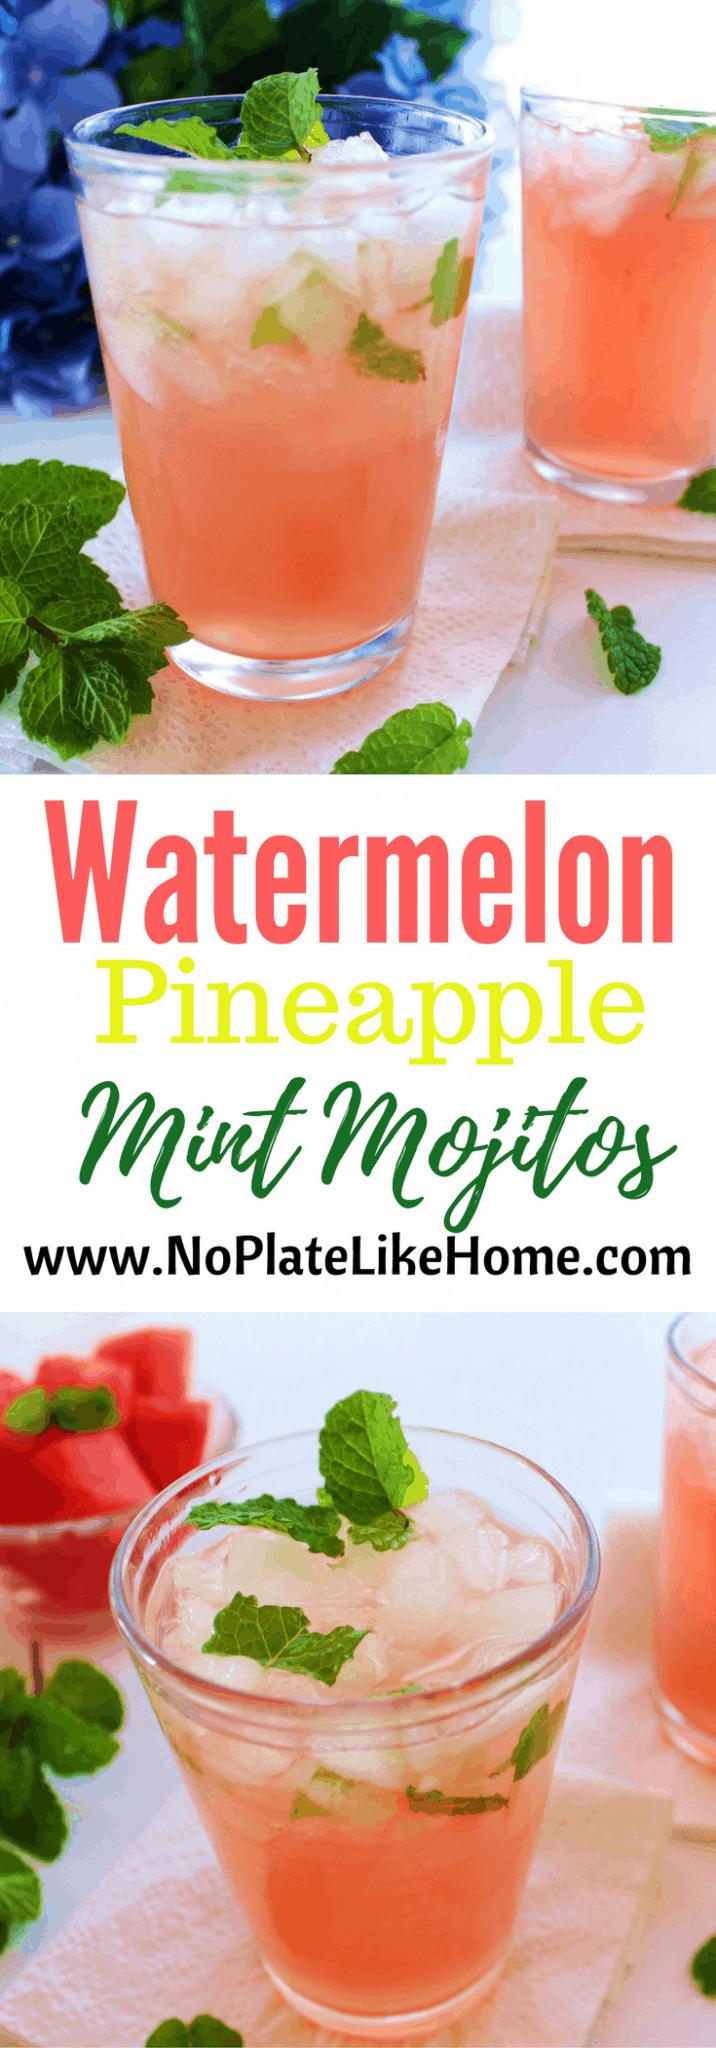 Watermelon Pineapple Mint Mojitos